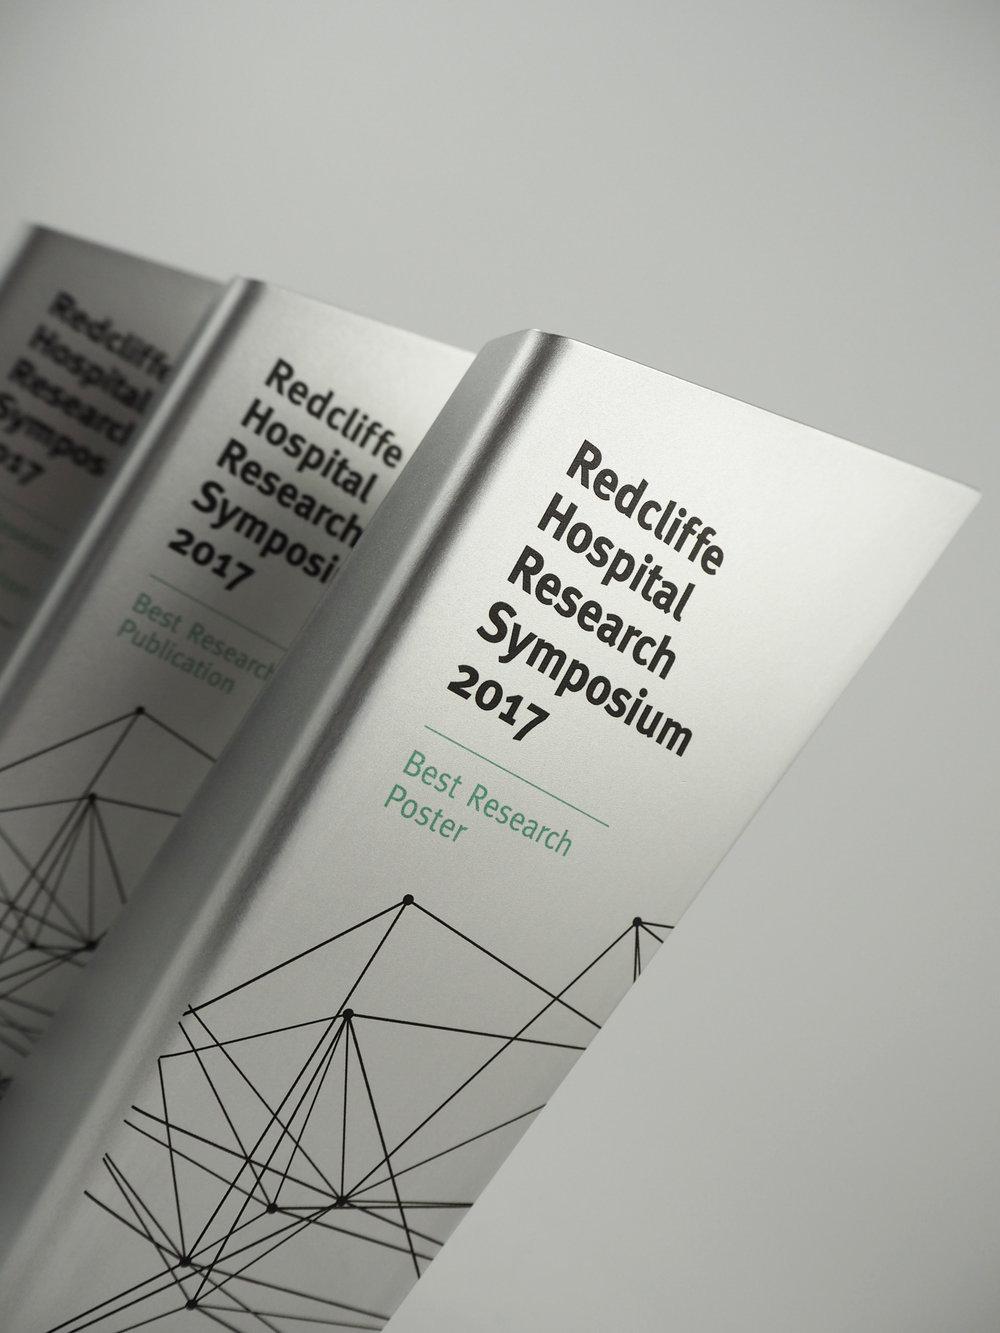 Redcliffe-Hospital-Symposium-eco-aluminium-trophy-award-02.jpg